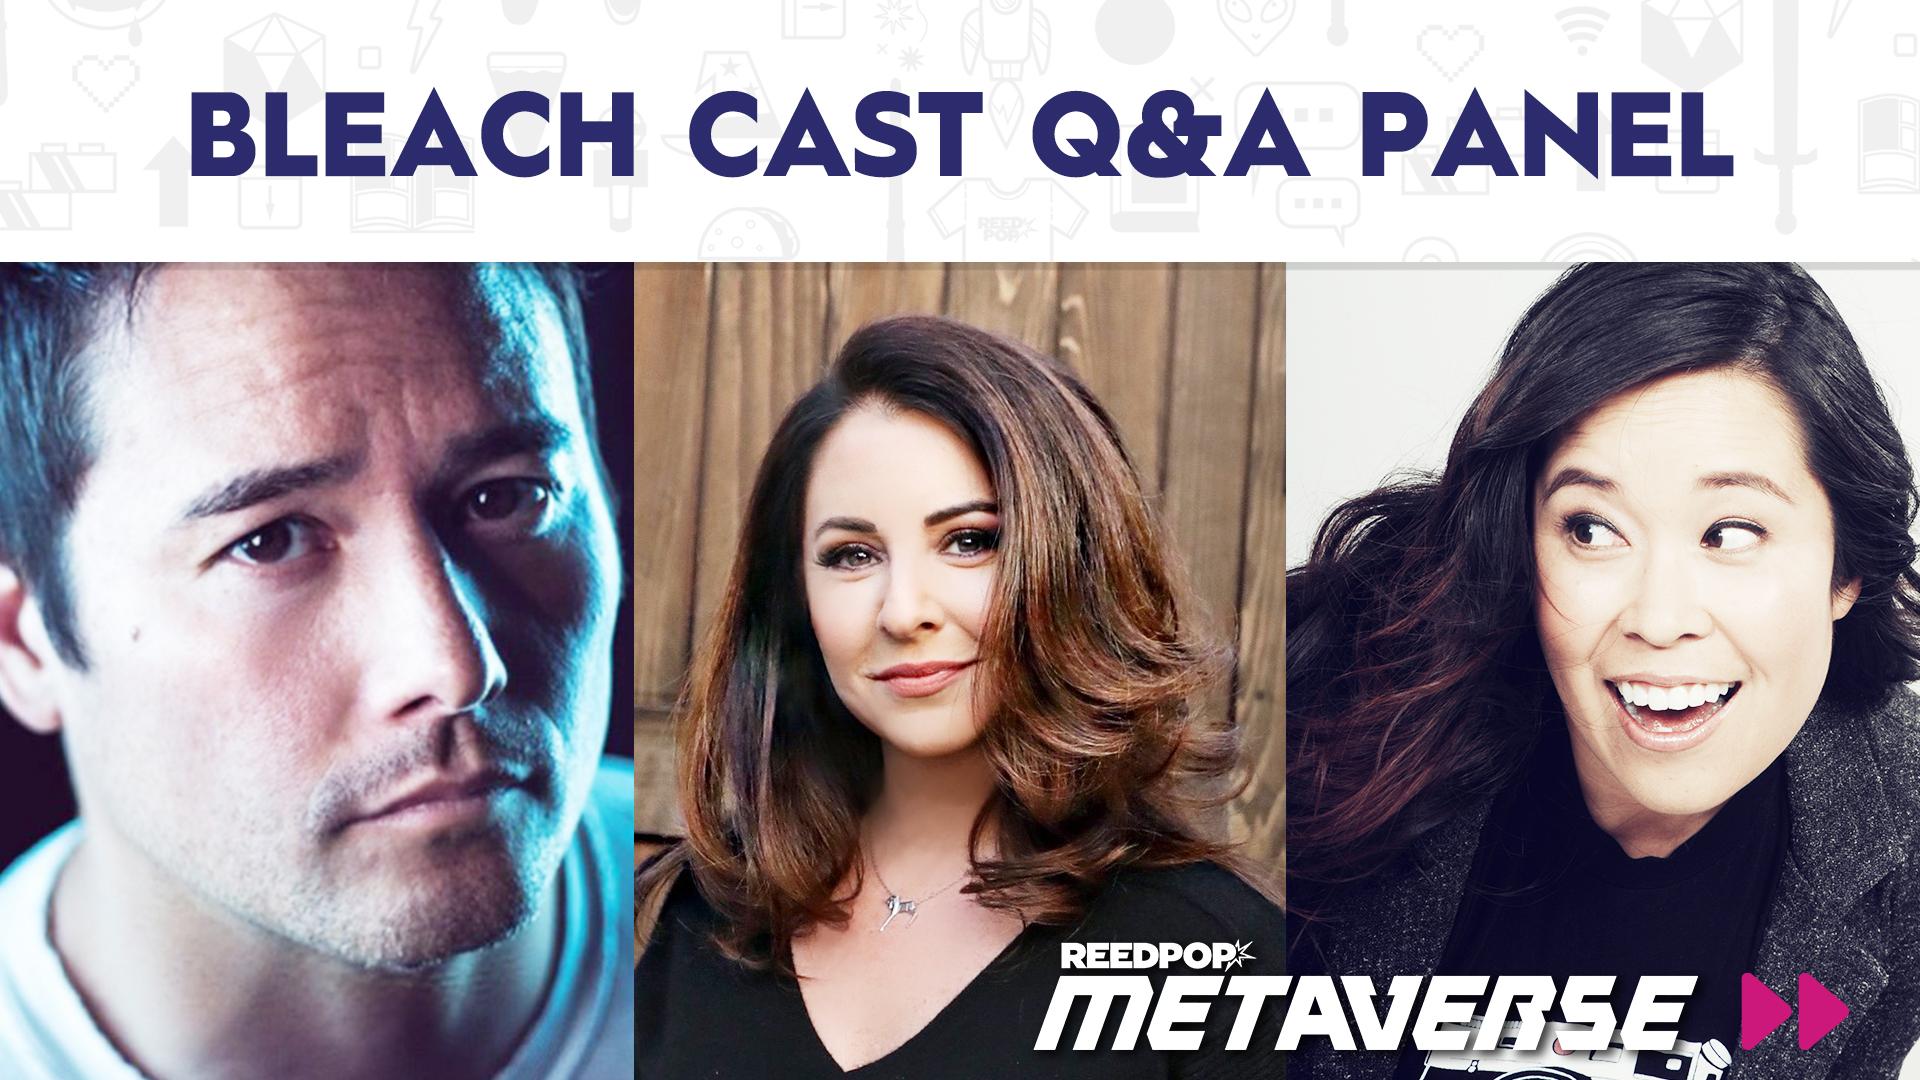 Image for Bleach Cast Q&A Panel